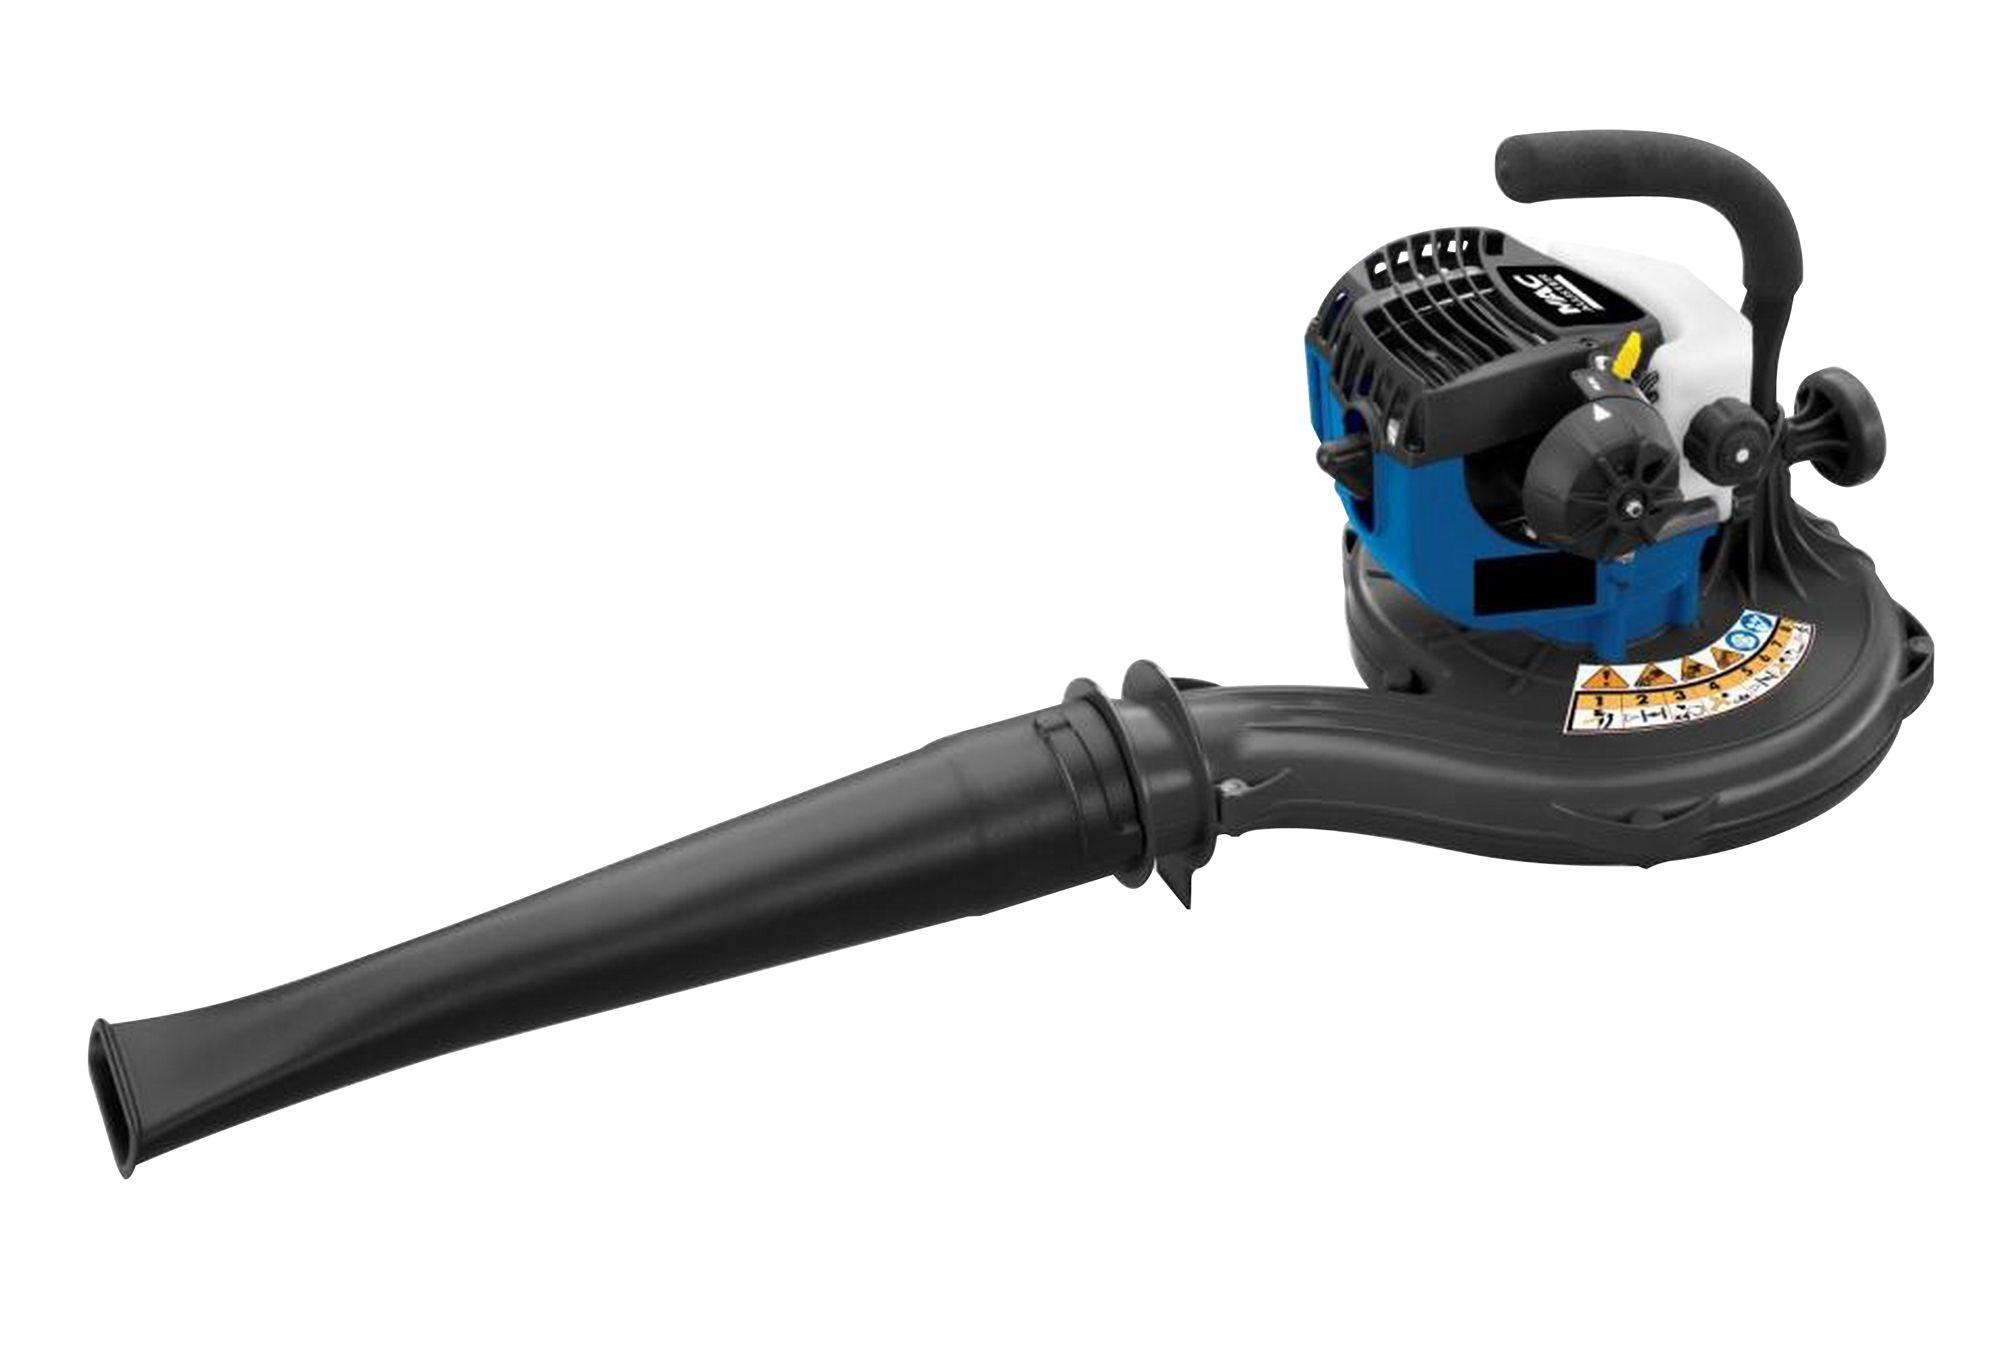 mac allister mbv260 26 cc petrol garden blower vacuum